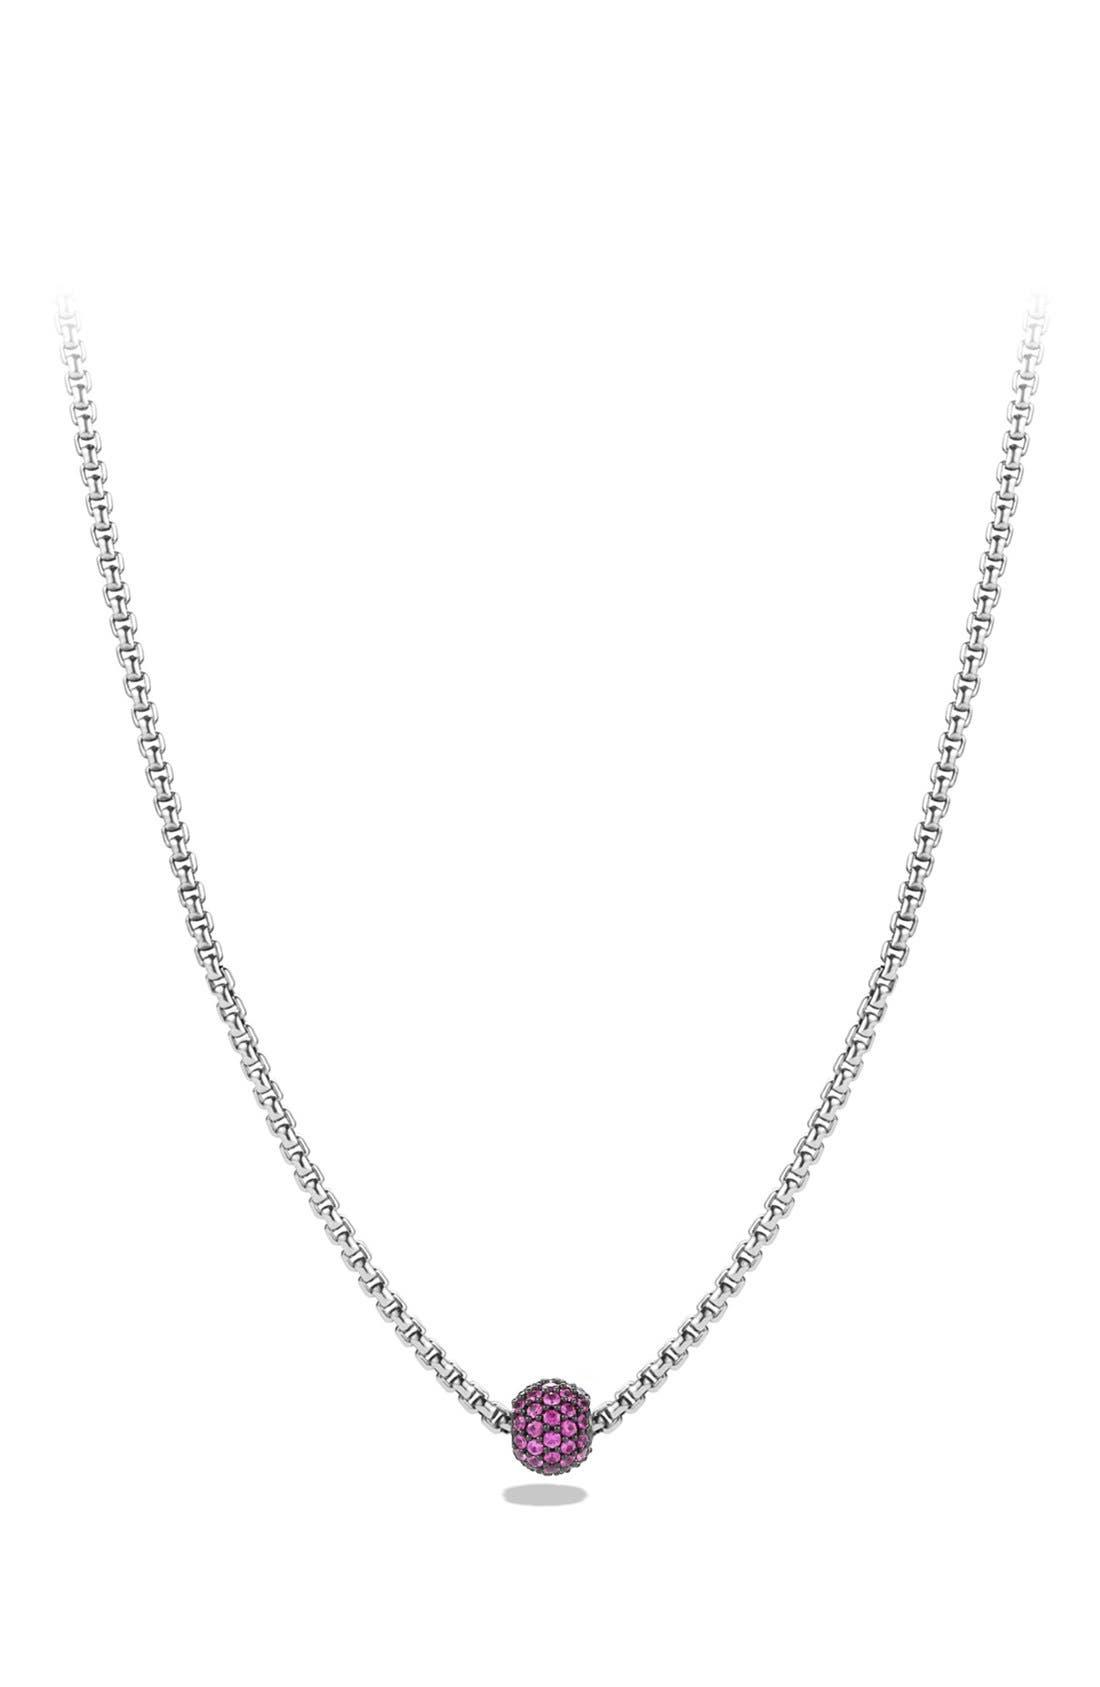 David Yurman 'Metro' Petite Pavé Chain Necklace with Sapphires